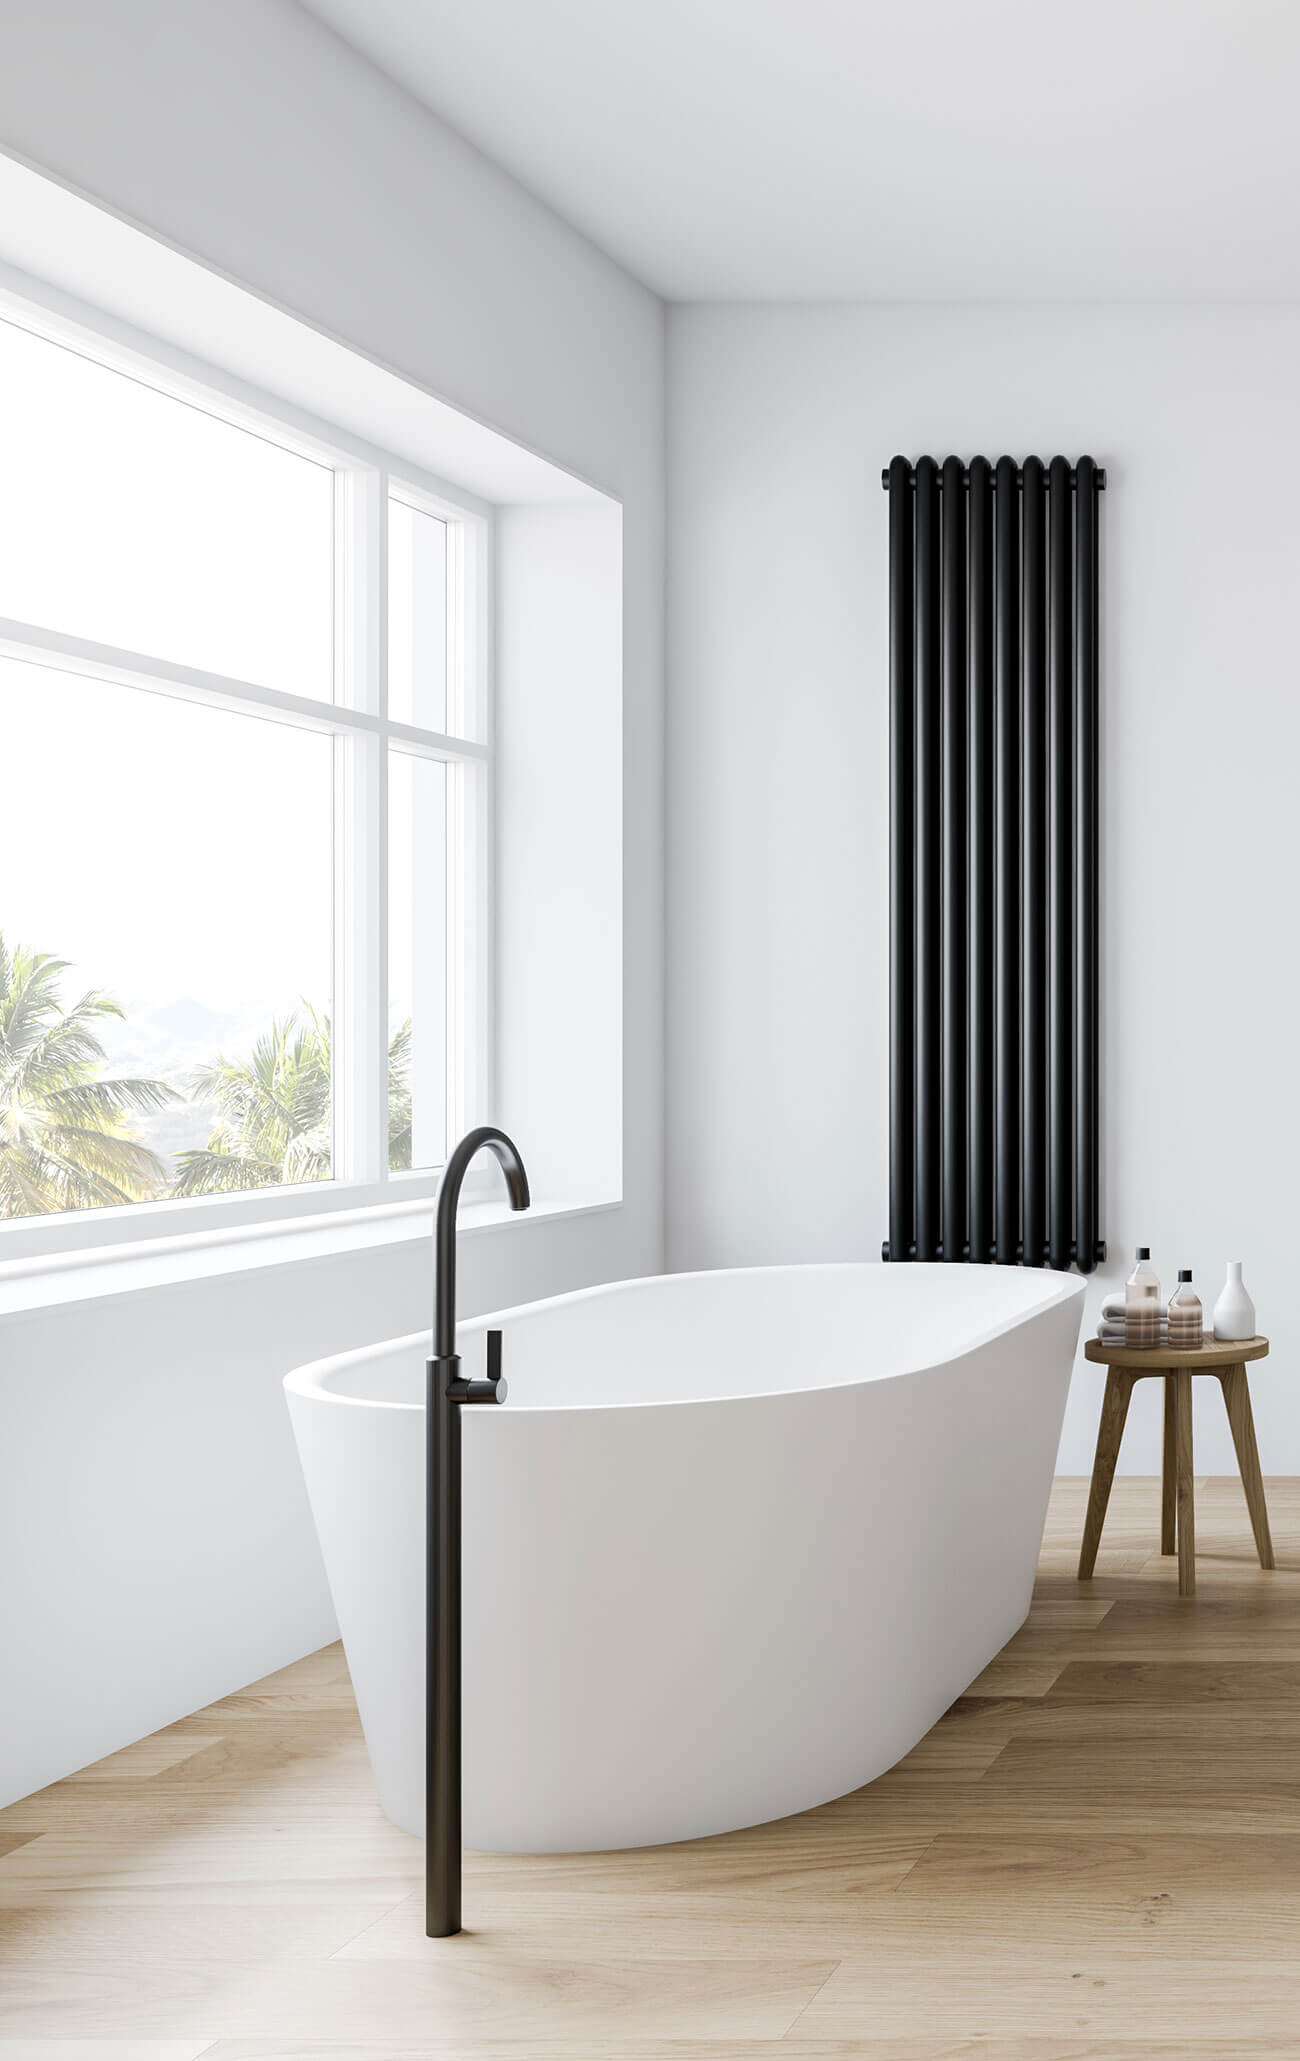 Darwin Bespoke bathroom design renovation